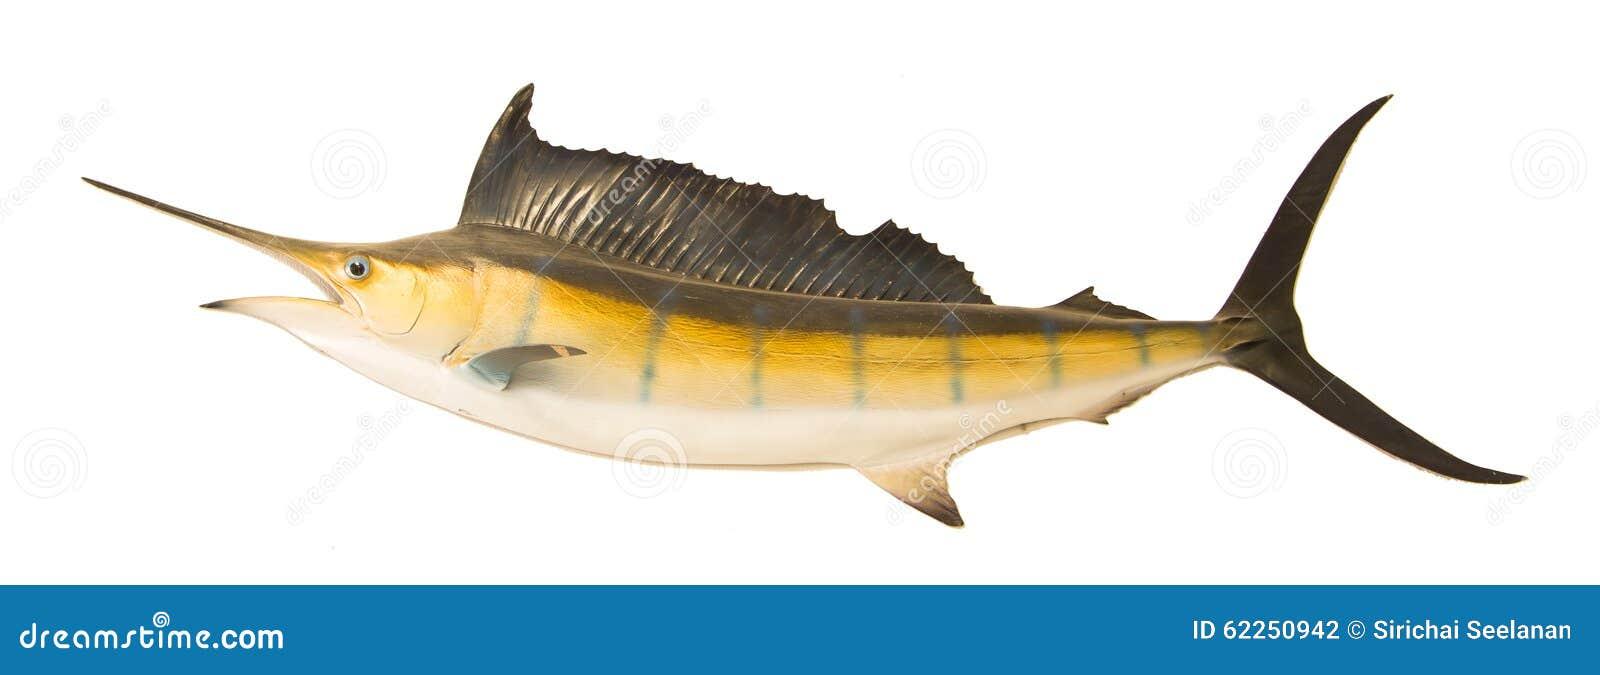 Sailfish πετώντας απομονωμένο midair άσπρο υπόβαθρο